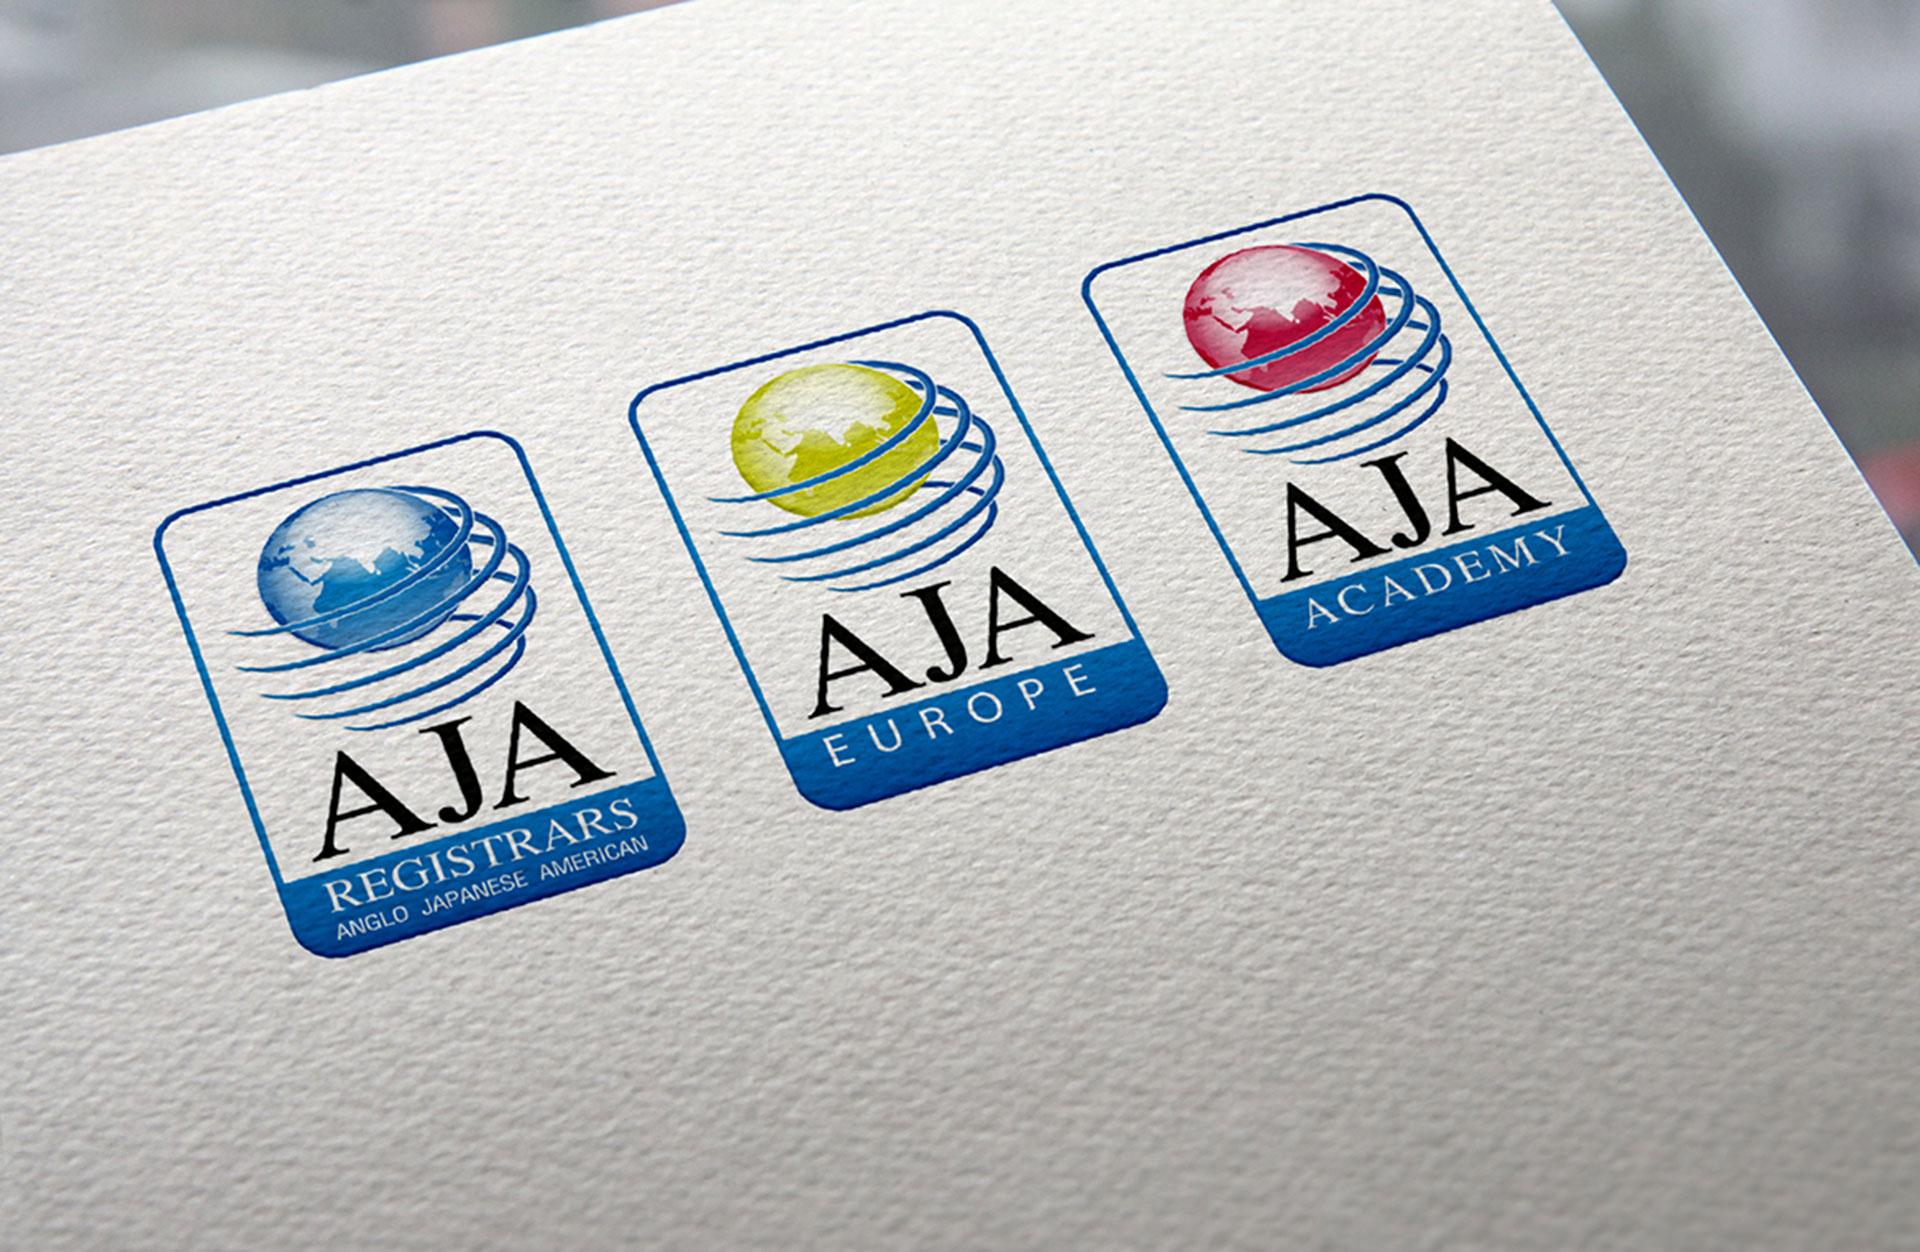 AJA-studio-immagine-coordinata